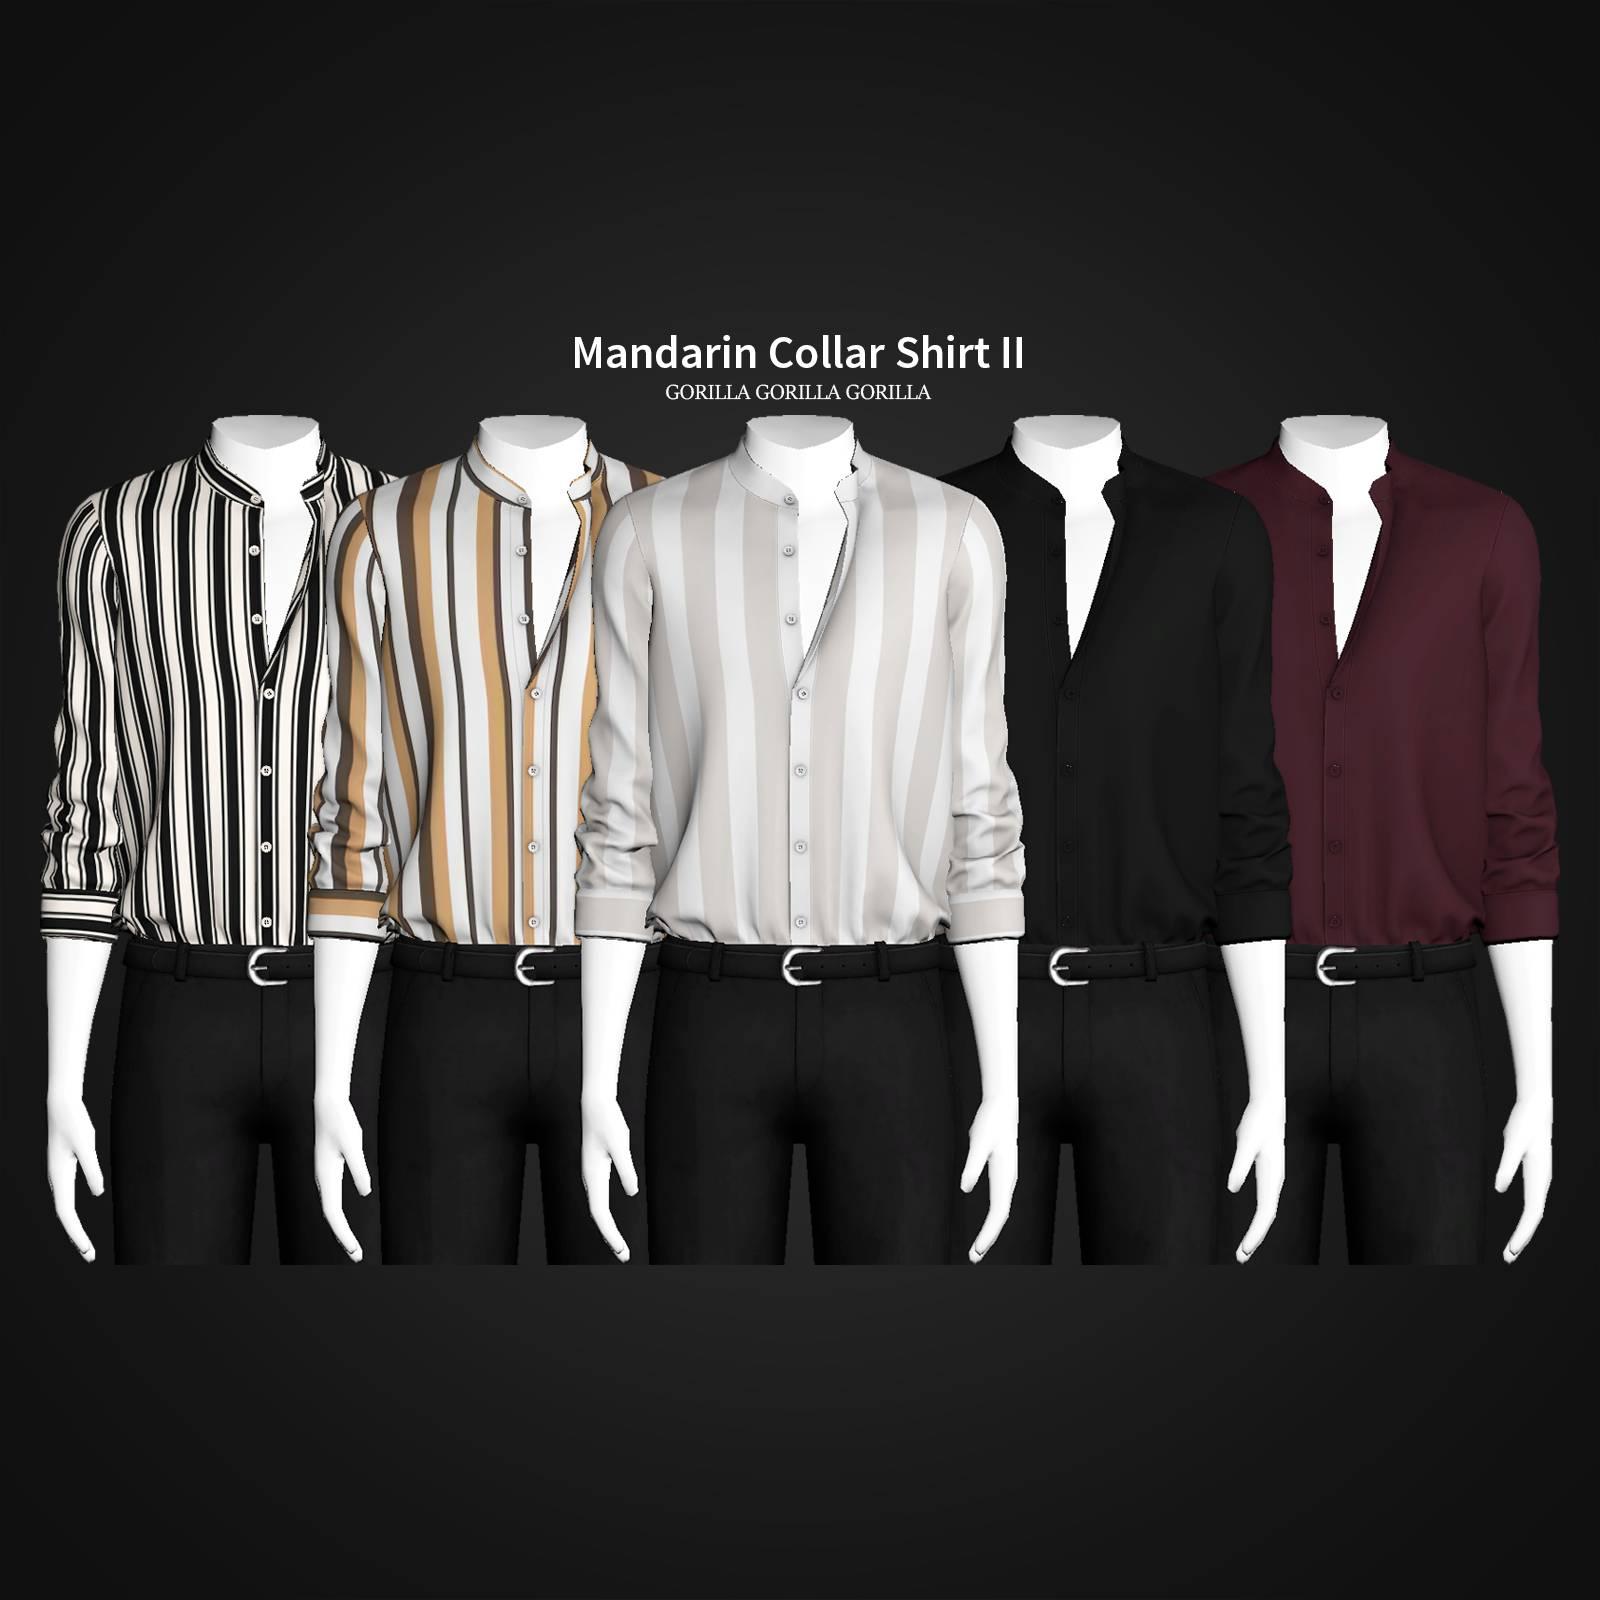 Мужская рубашка - Mandarin Collar Shirt II